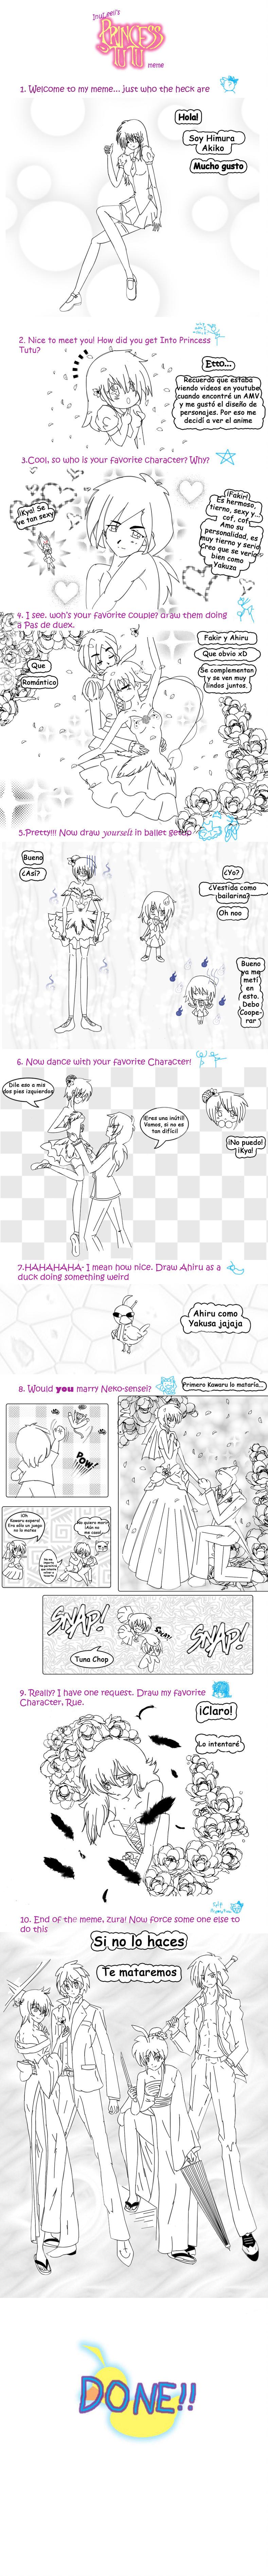 Meme PT Spanish Version by Akiko-Himura